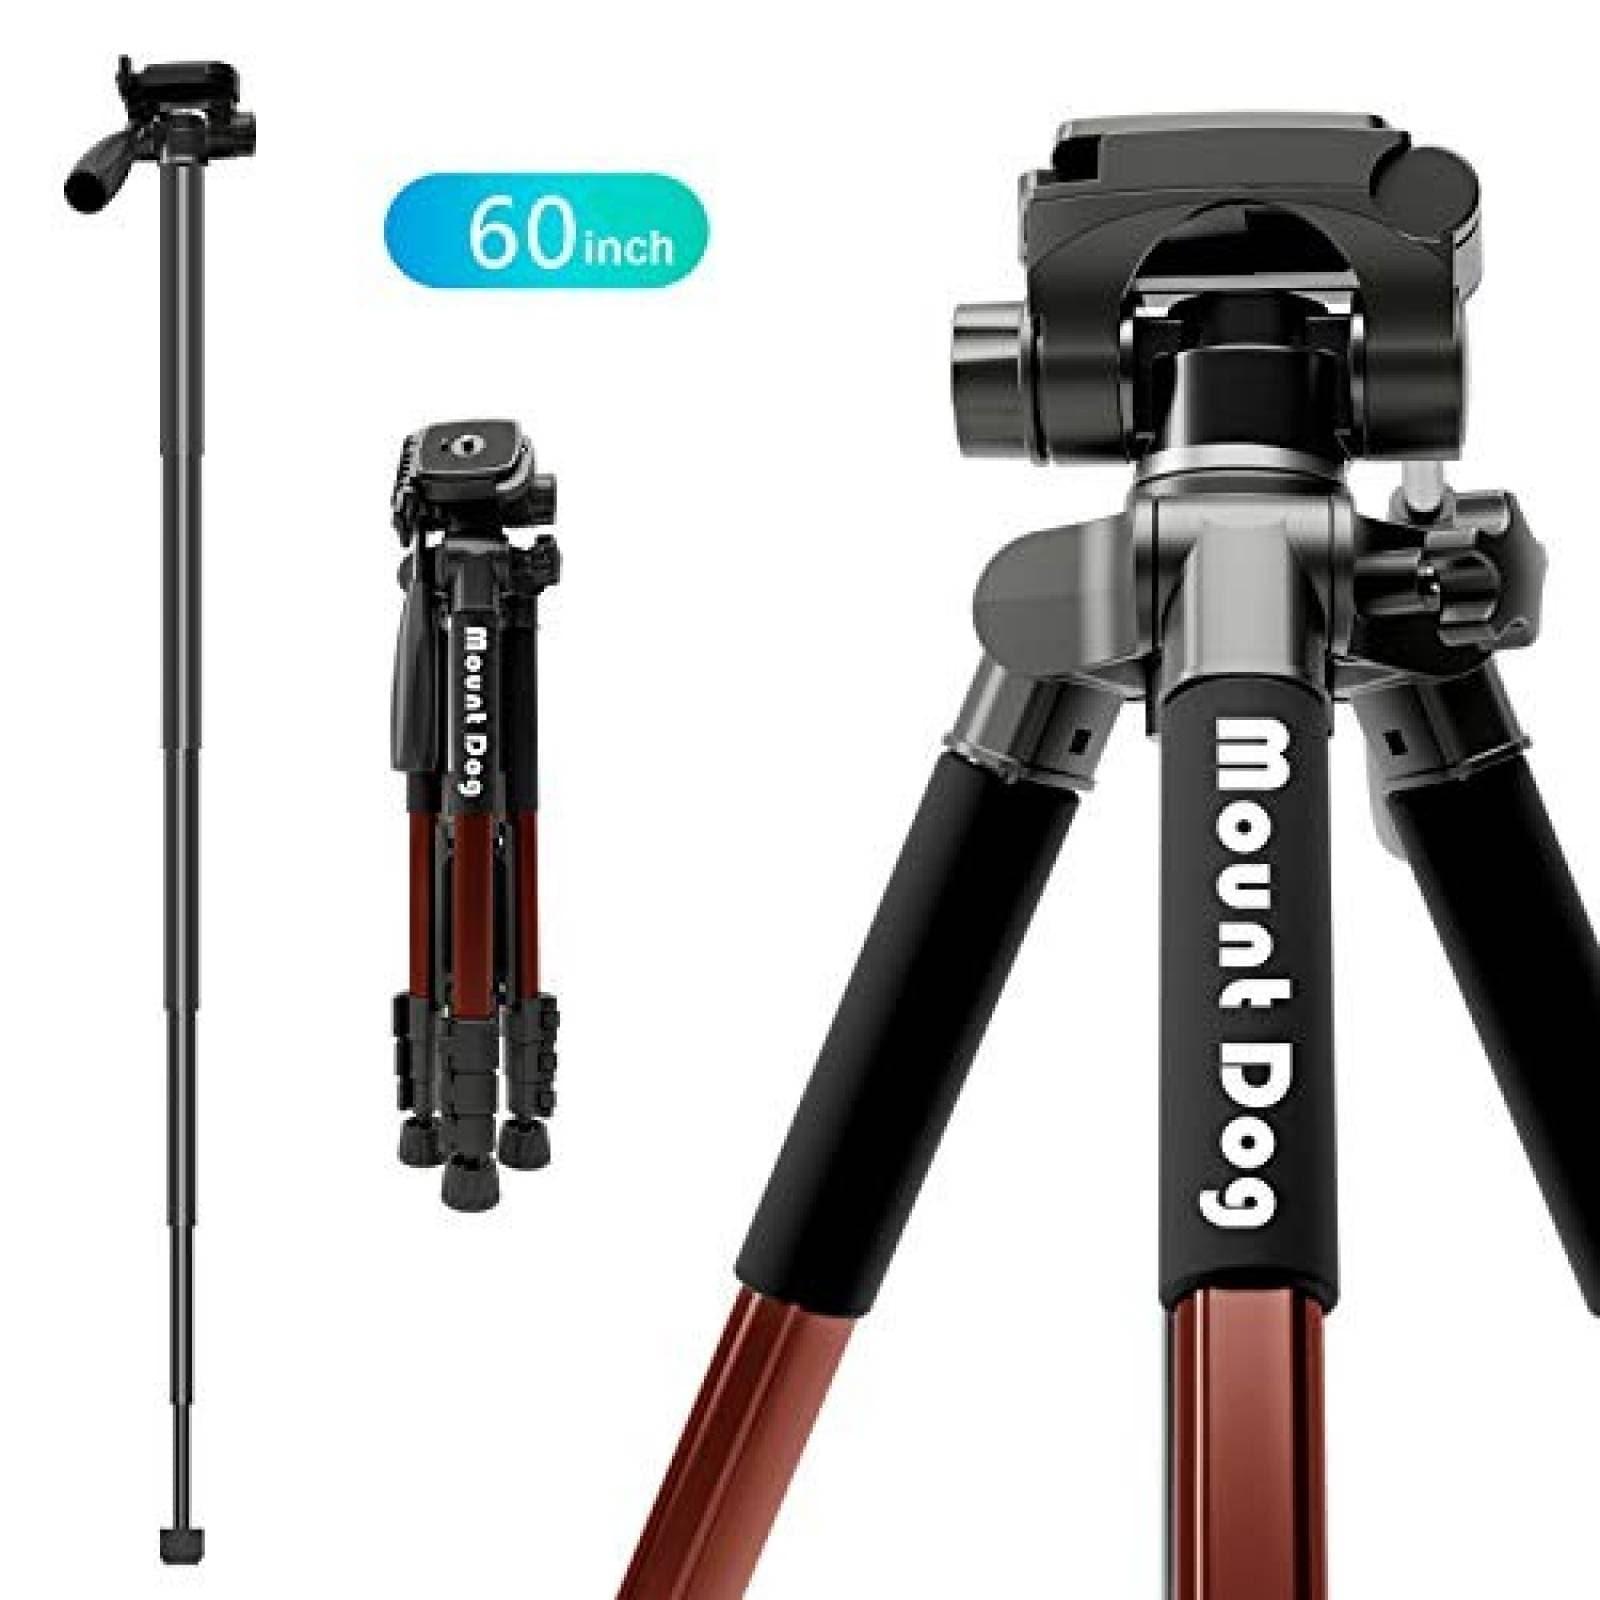 Trípode y monopod MOUNTDOG 60'' 360º para cámara -Naranja